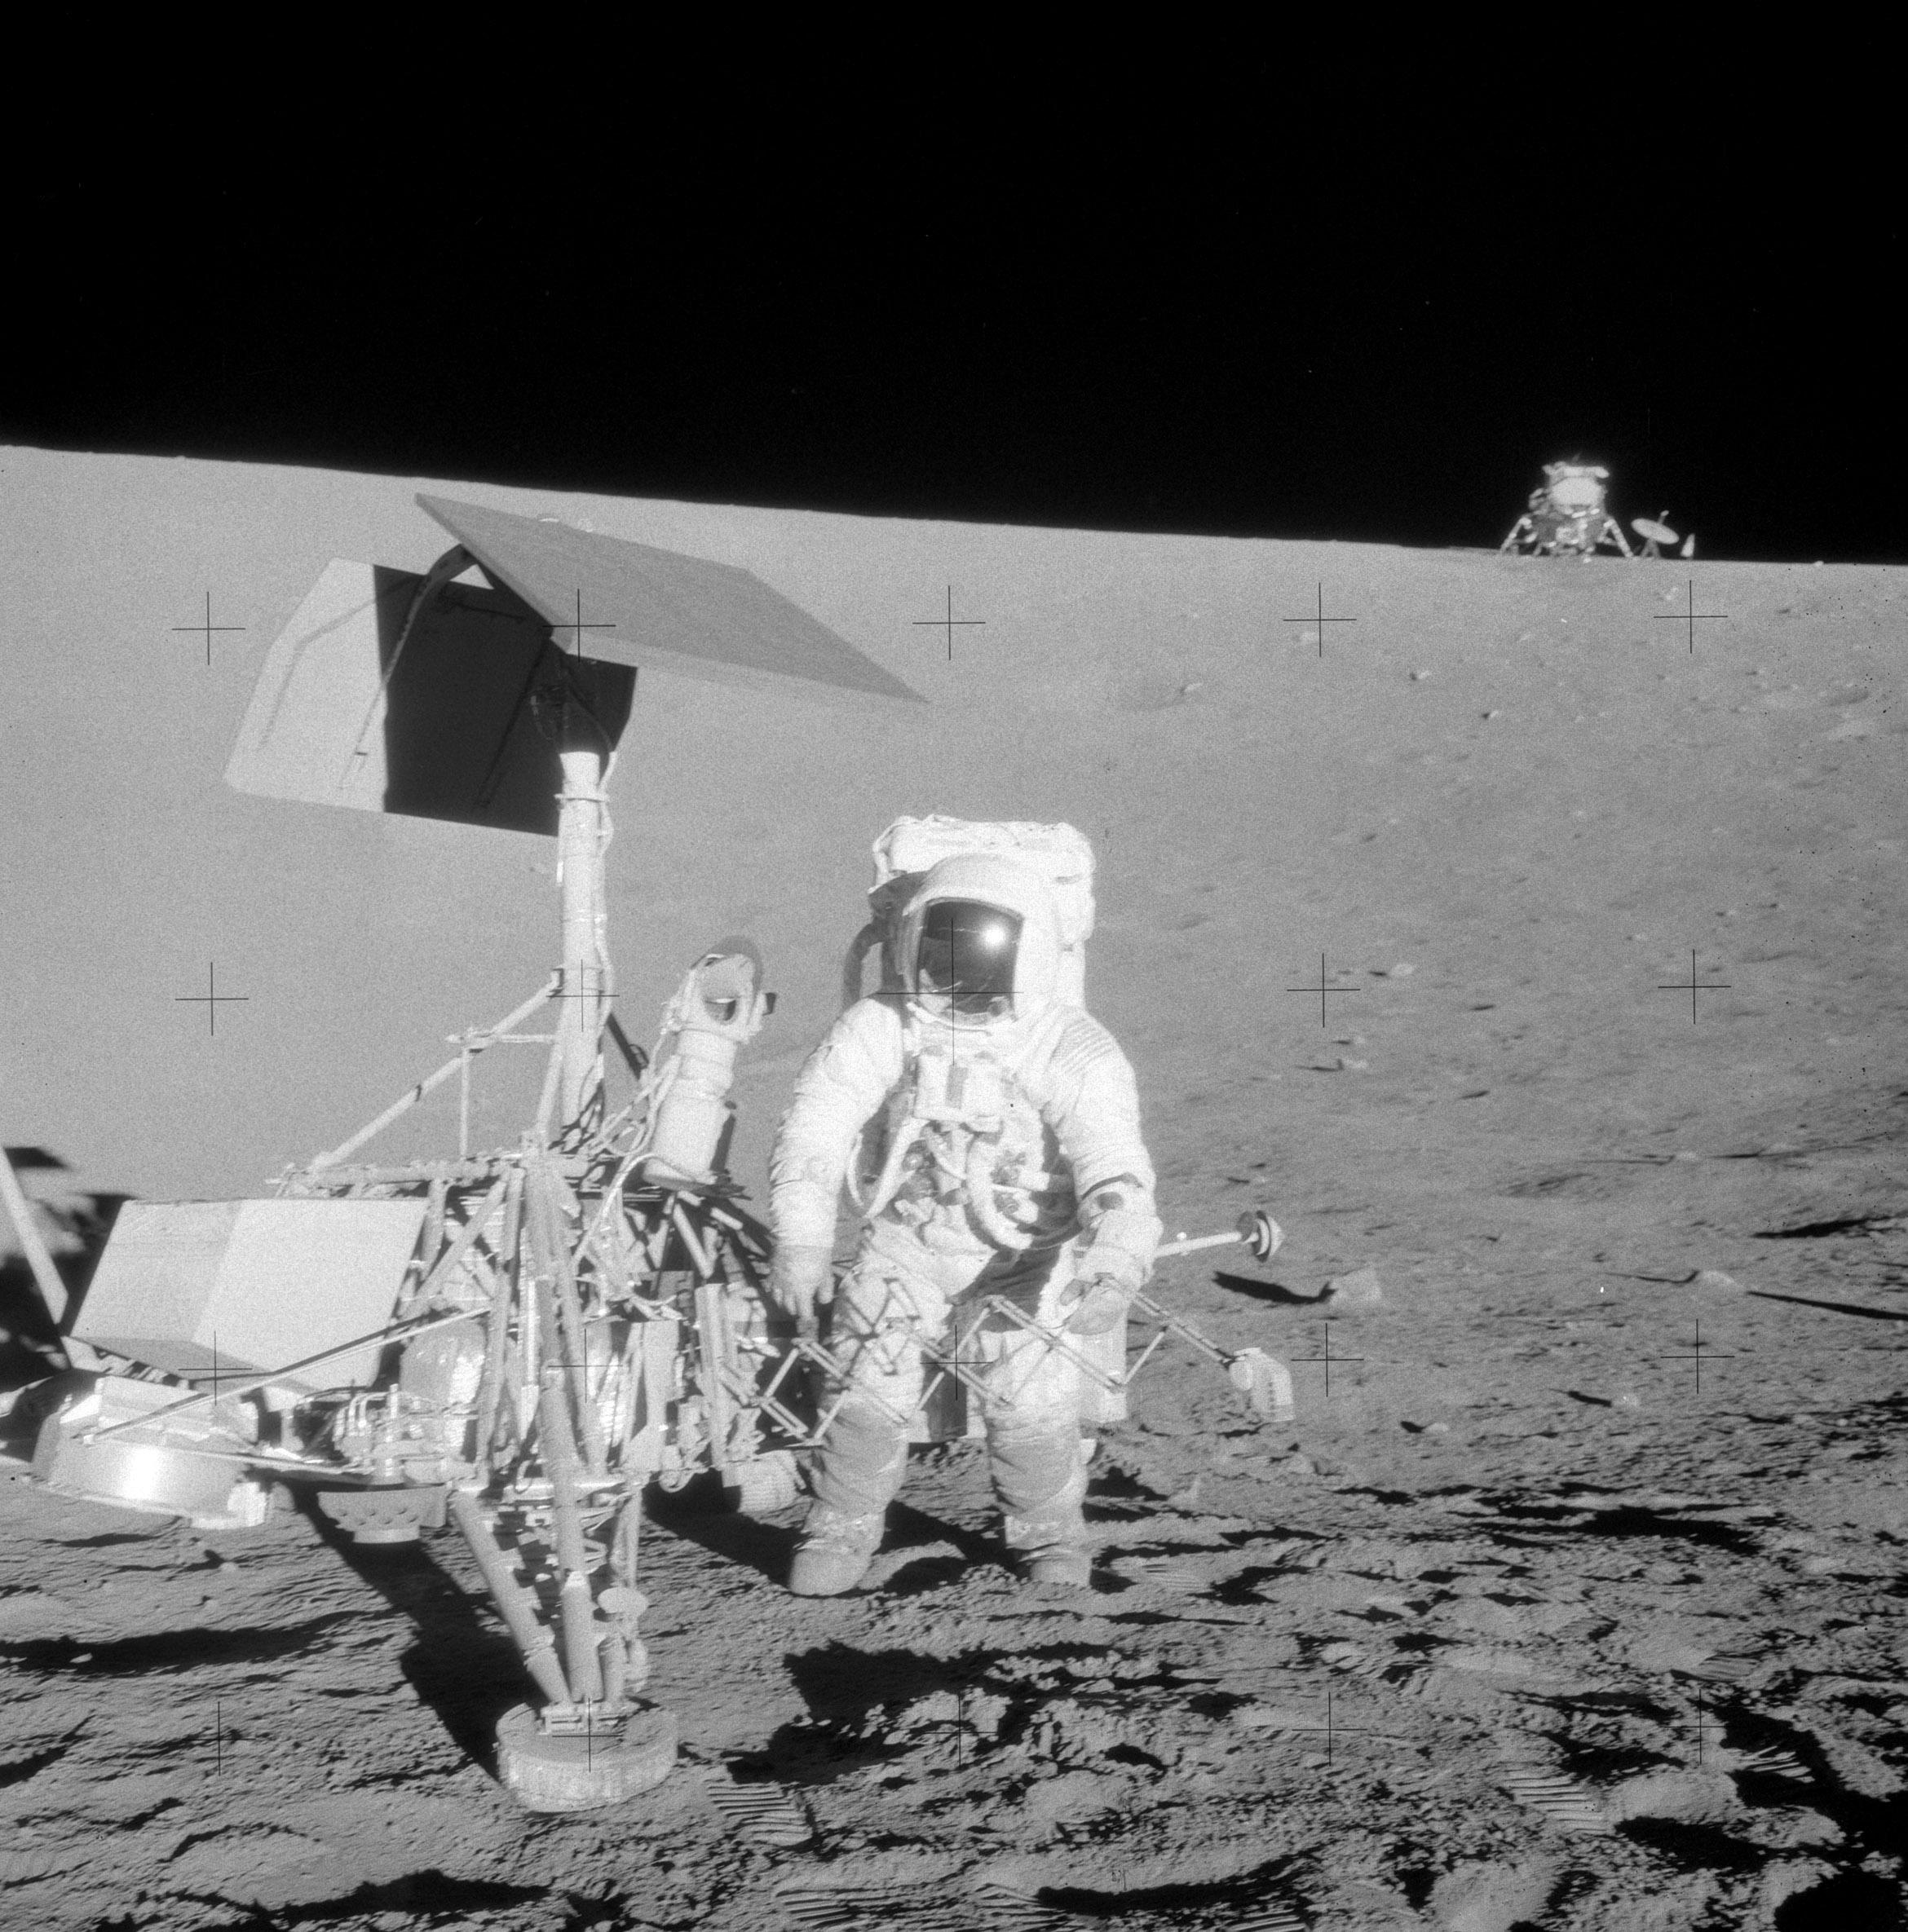 Apollo_12_and_Surveyor_7135